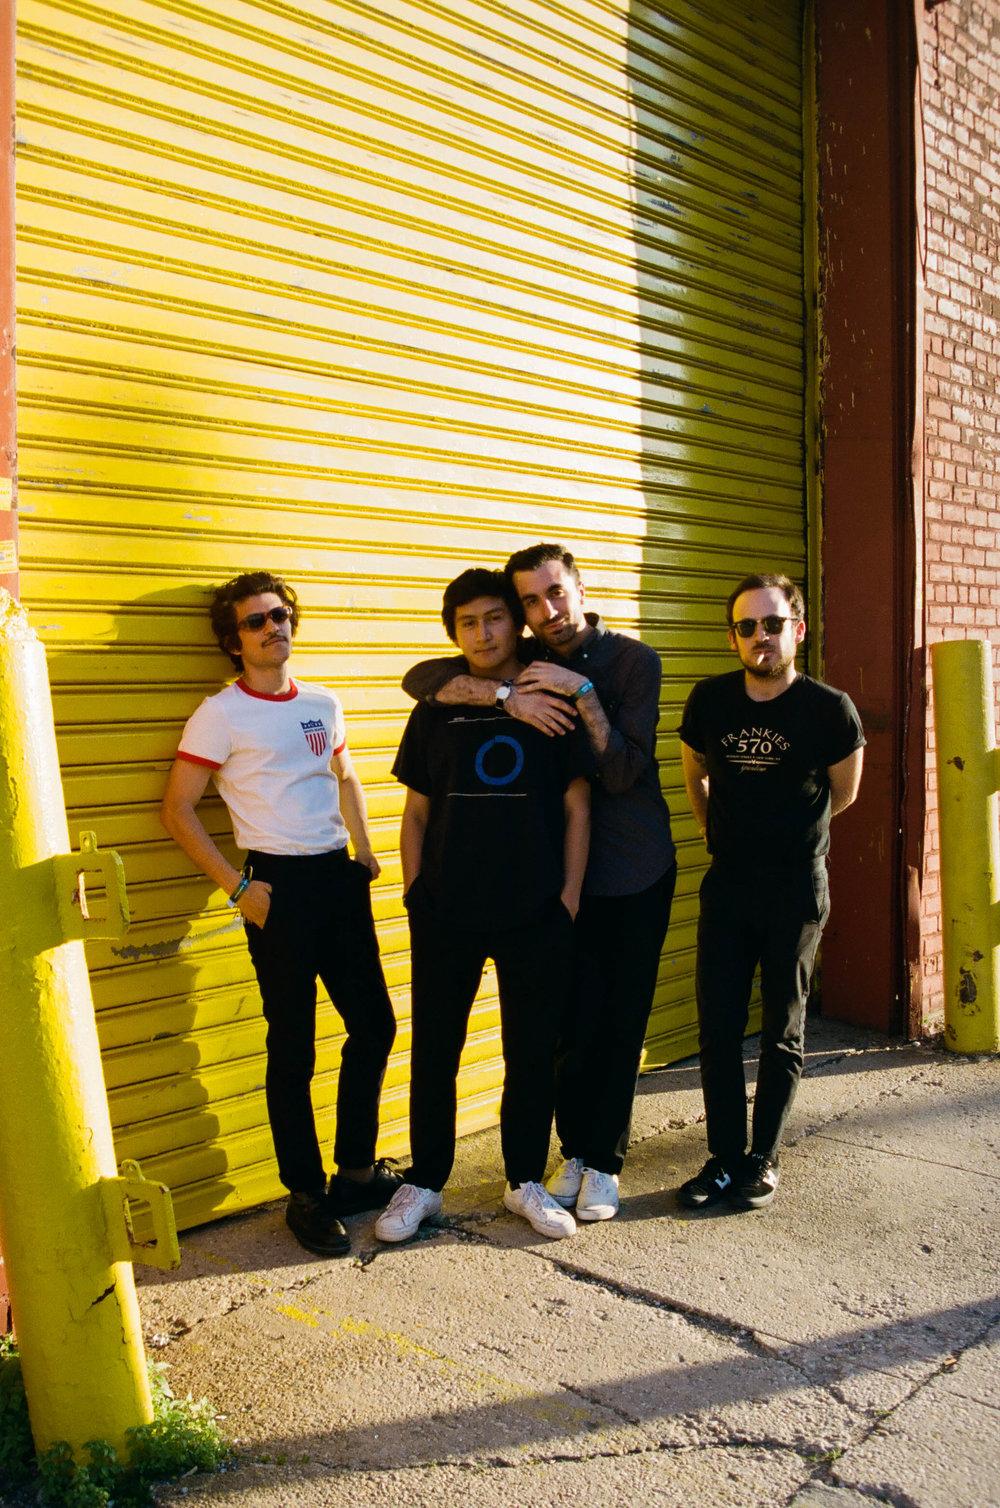 Photographed by Rachel Cabitt